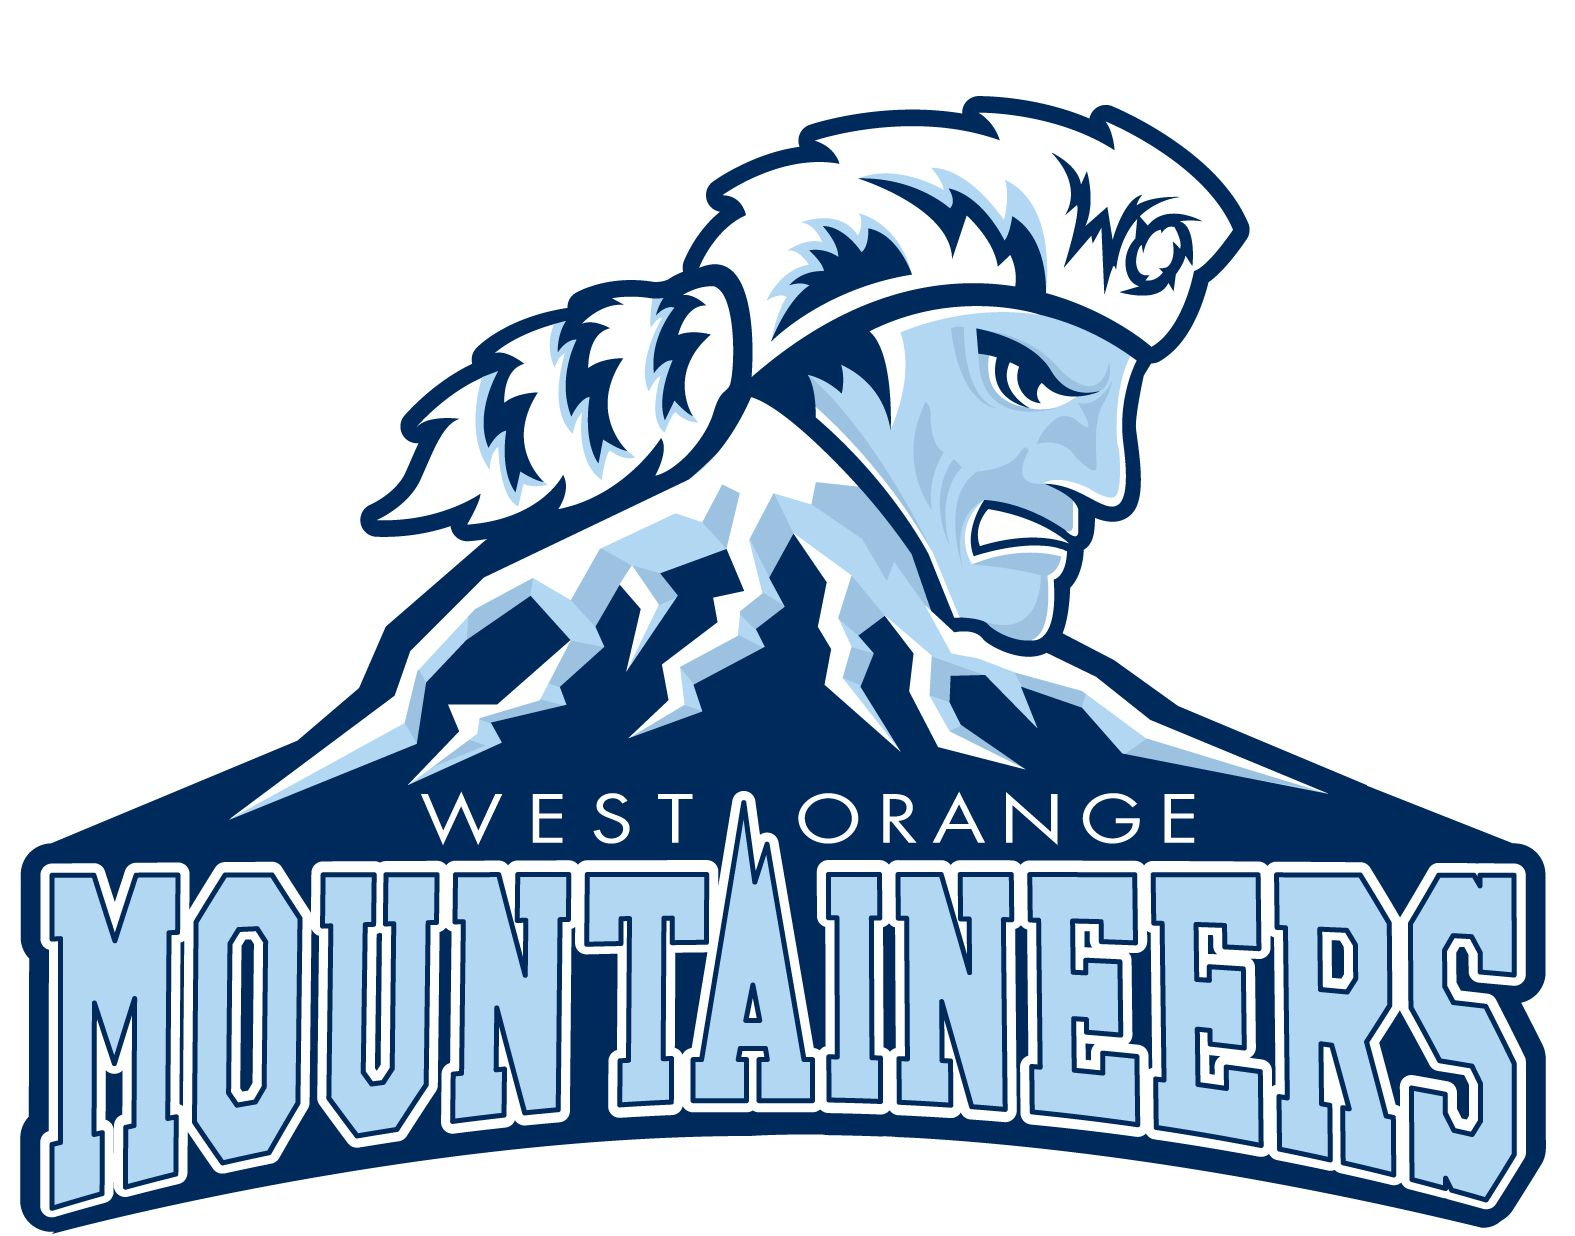 Wohs Mountaineers Athlete West Orange High School